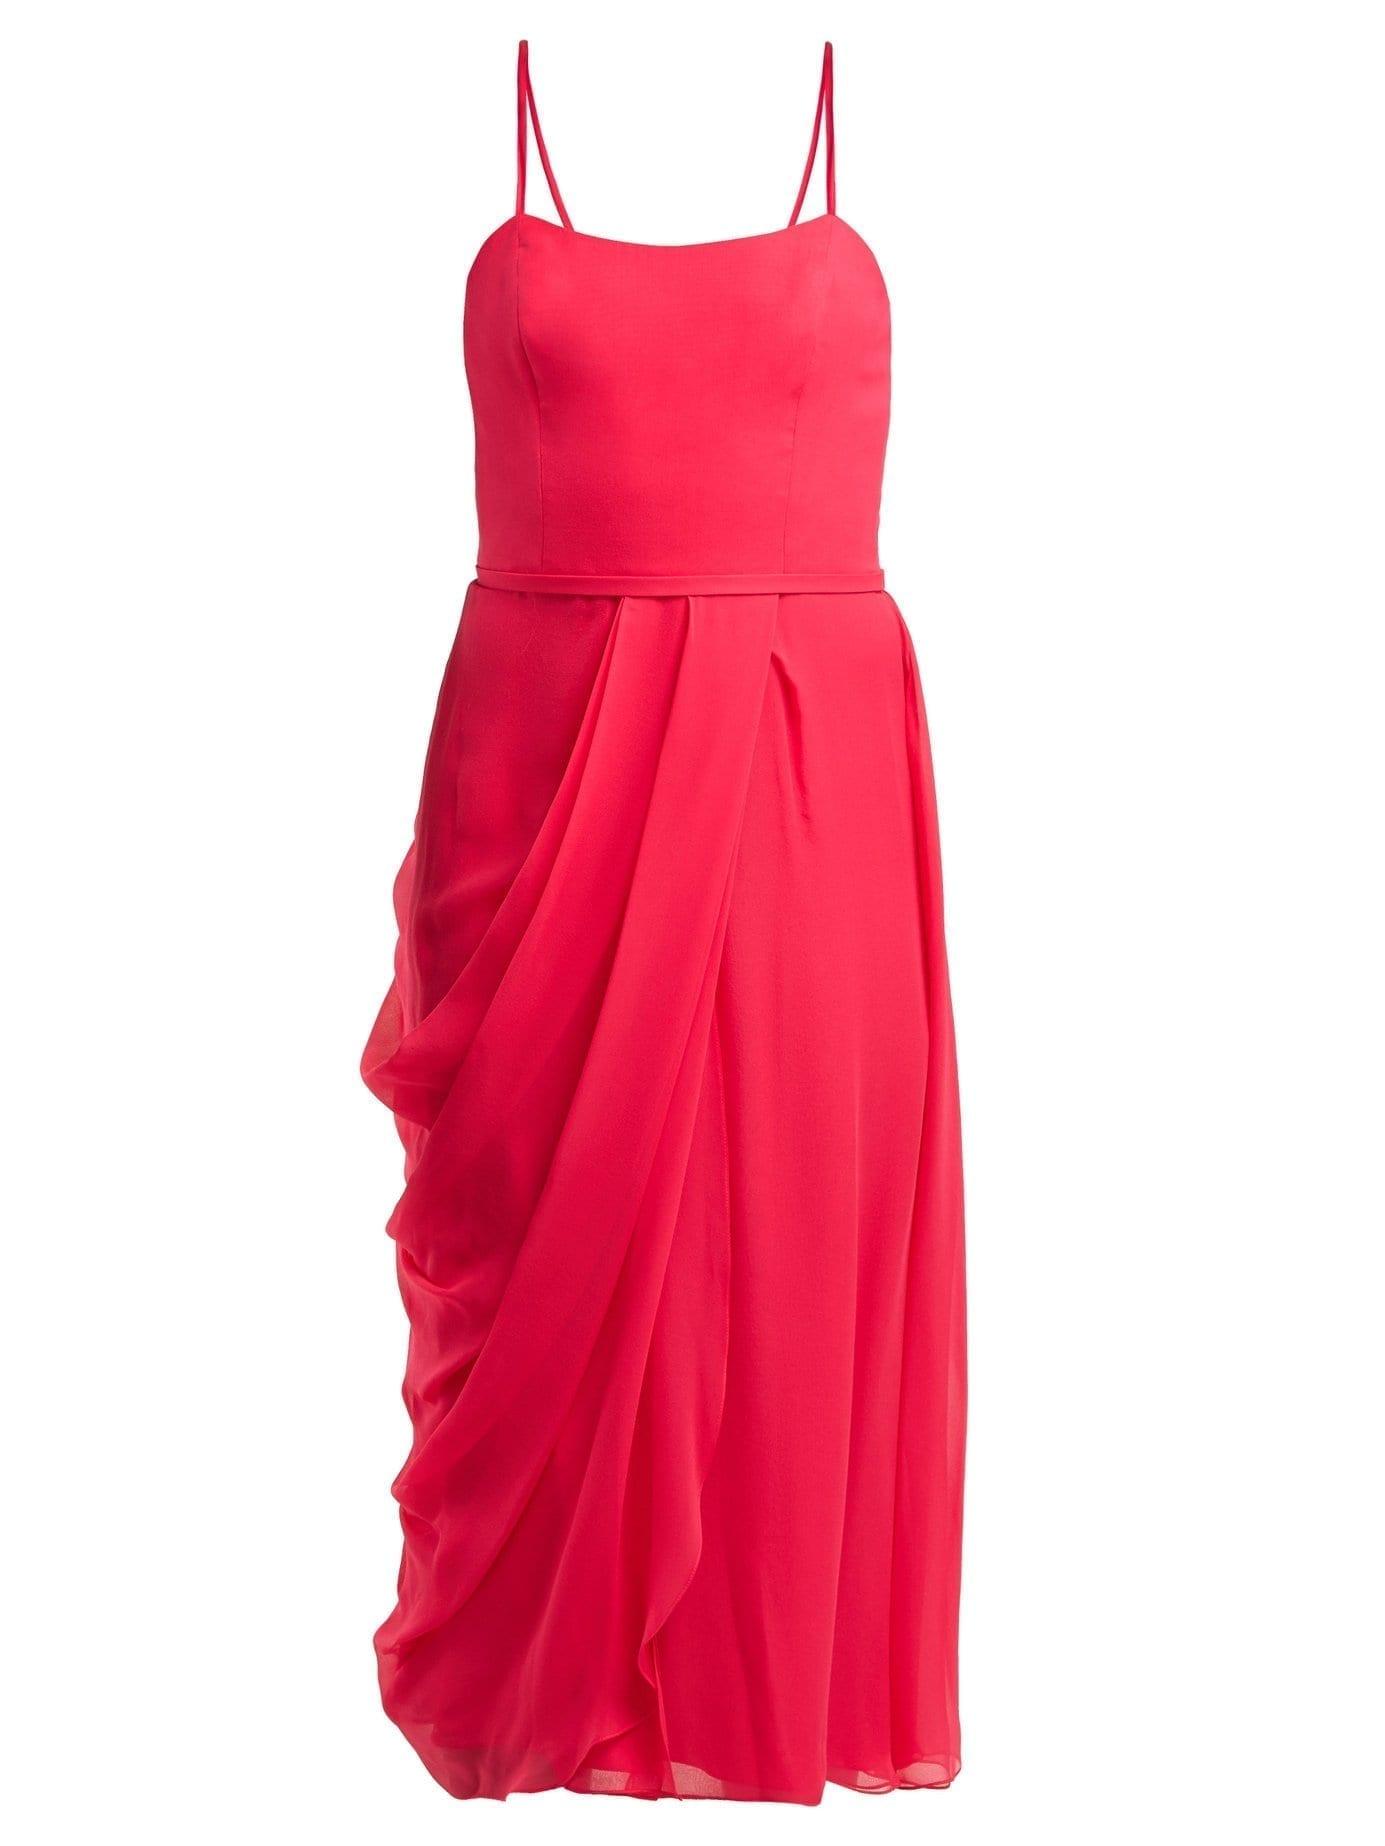 d26b41aee0e5a CAROLINA HERRERA Draped Silk-Chiffon Midi Pink Dress - We Select Dresses